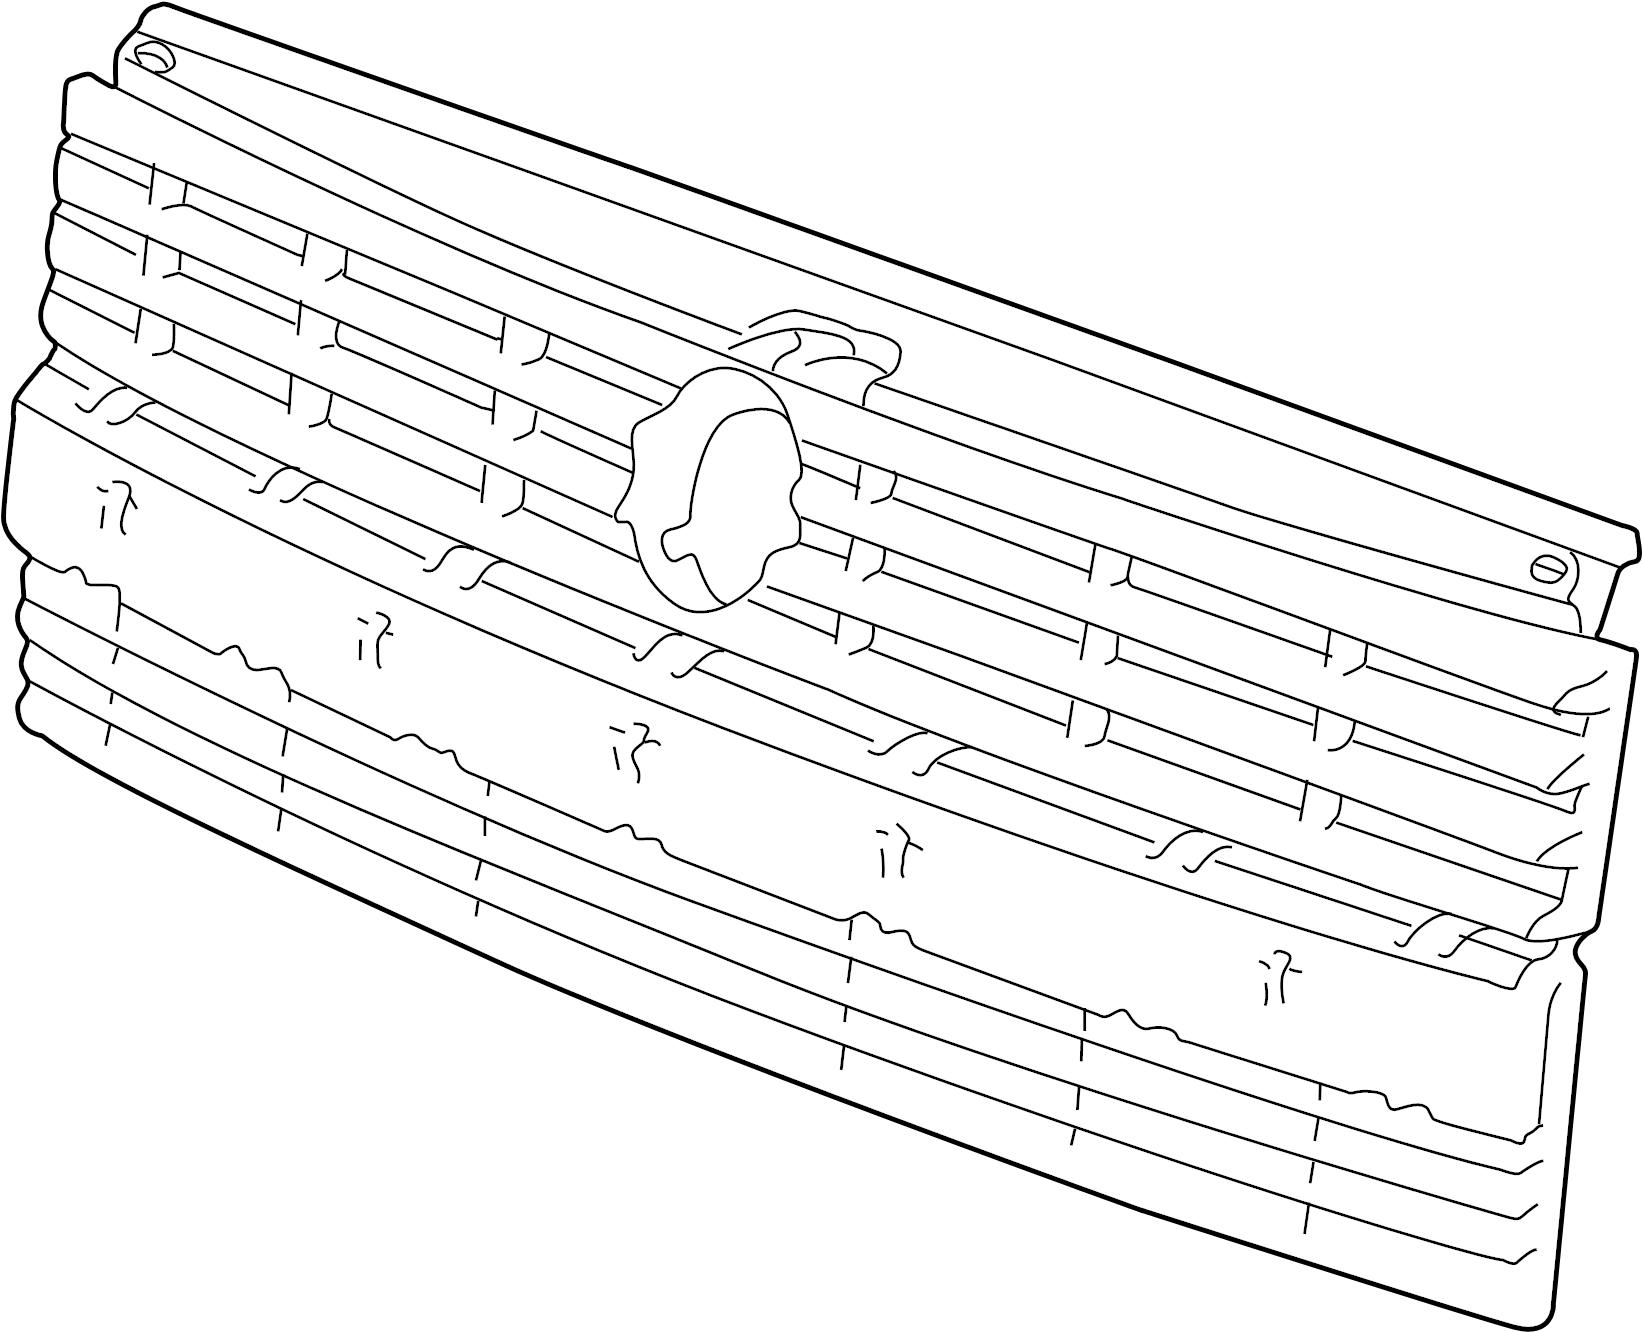 Wiring Diagram 1995 Vw Eurovan. Vacuum. Auto Wiring Diagram